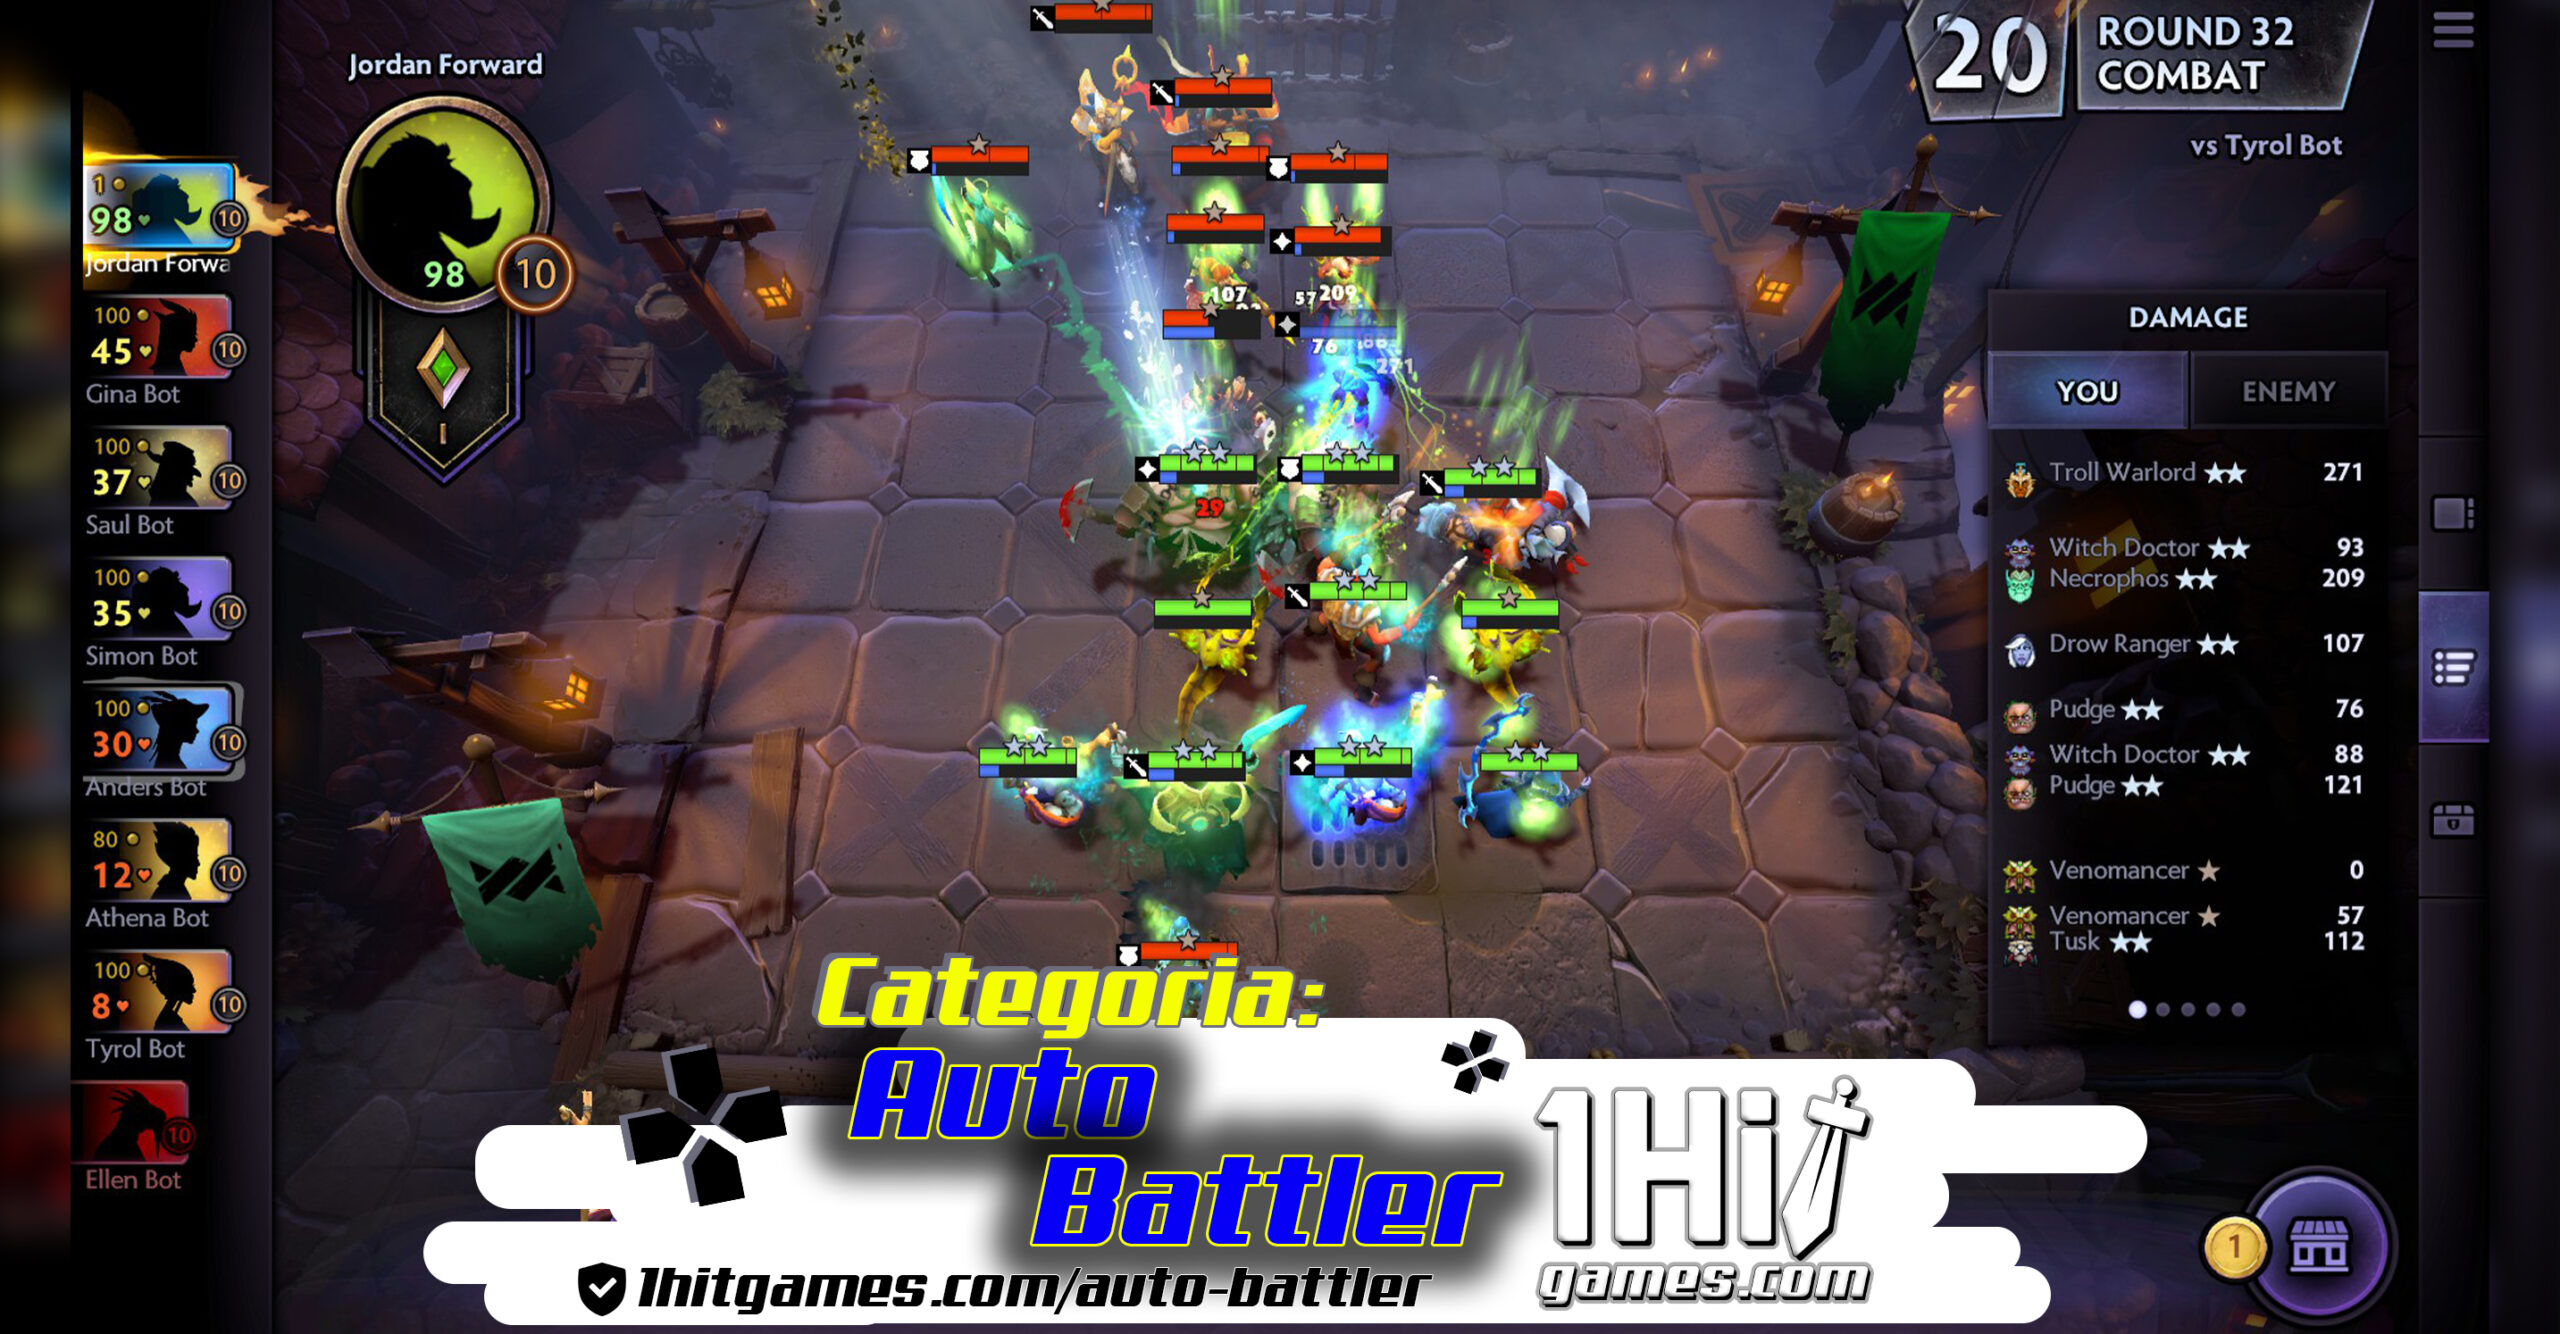 auto battler DotA-Underlords 1hitgames estrategia chess autochess bots Bruxos Caçadores Caçadores de Demônios TFT TeamFight Tactics